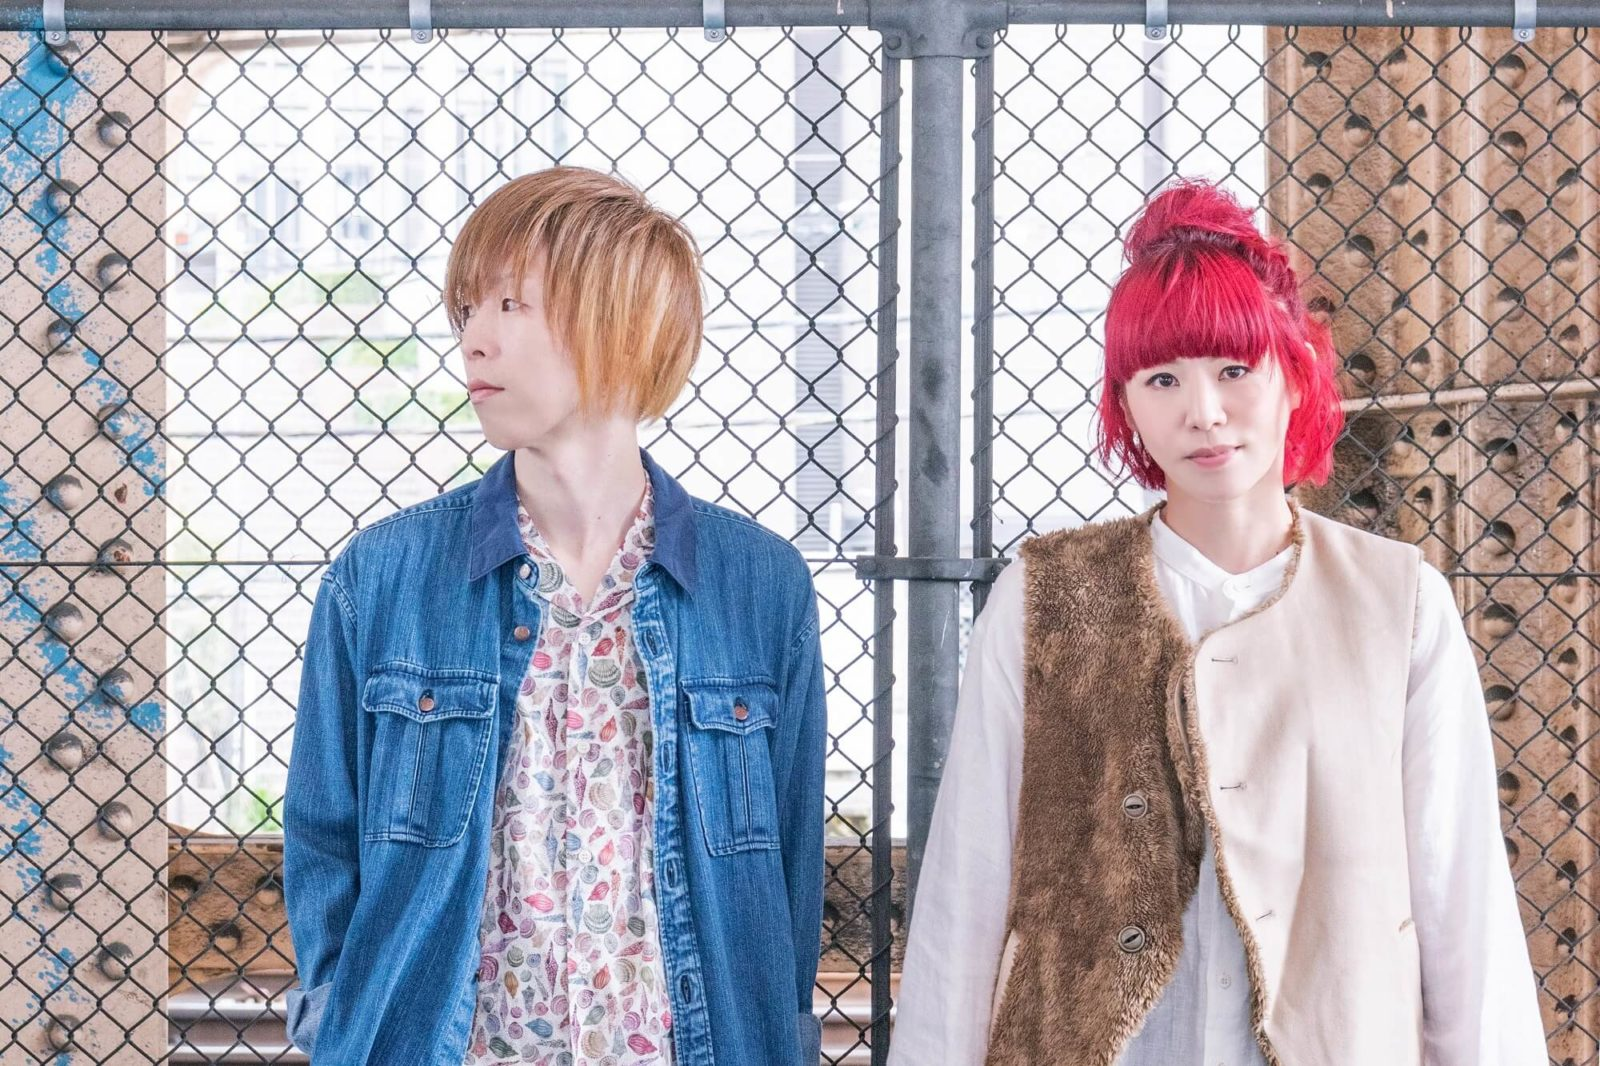 nano.RIPE、NHKみんなのうた「ヨルガオ」のシングルリリースが8月21日に決定サムネイル画像!